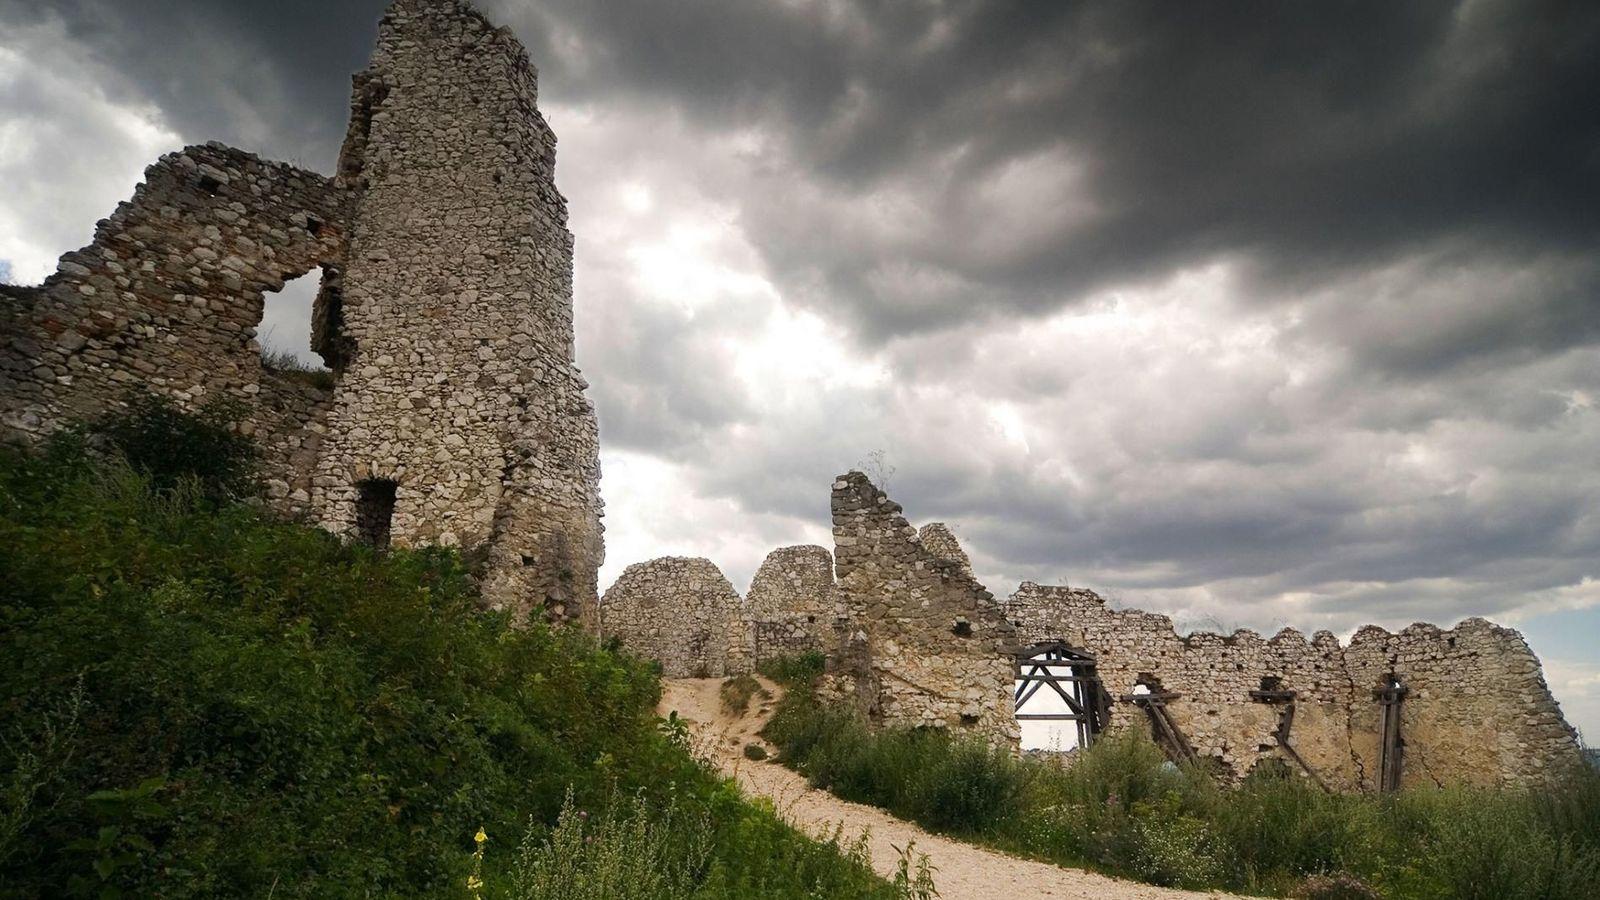 Château de Čachtice, Slovaquie - L'histoire de ce château qui a servi de décor au film Nosferatu ...